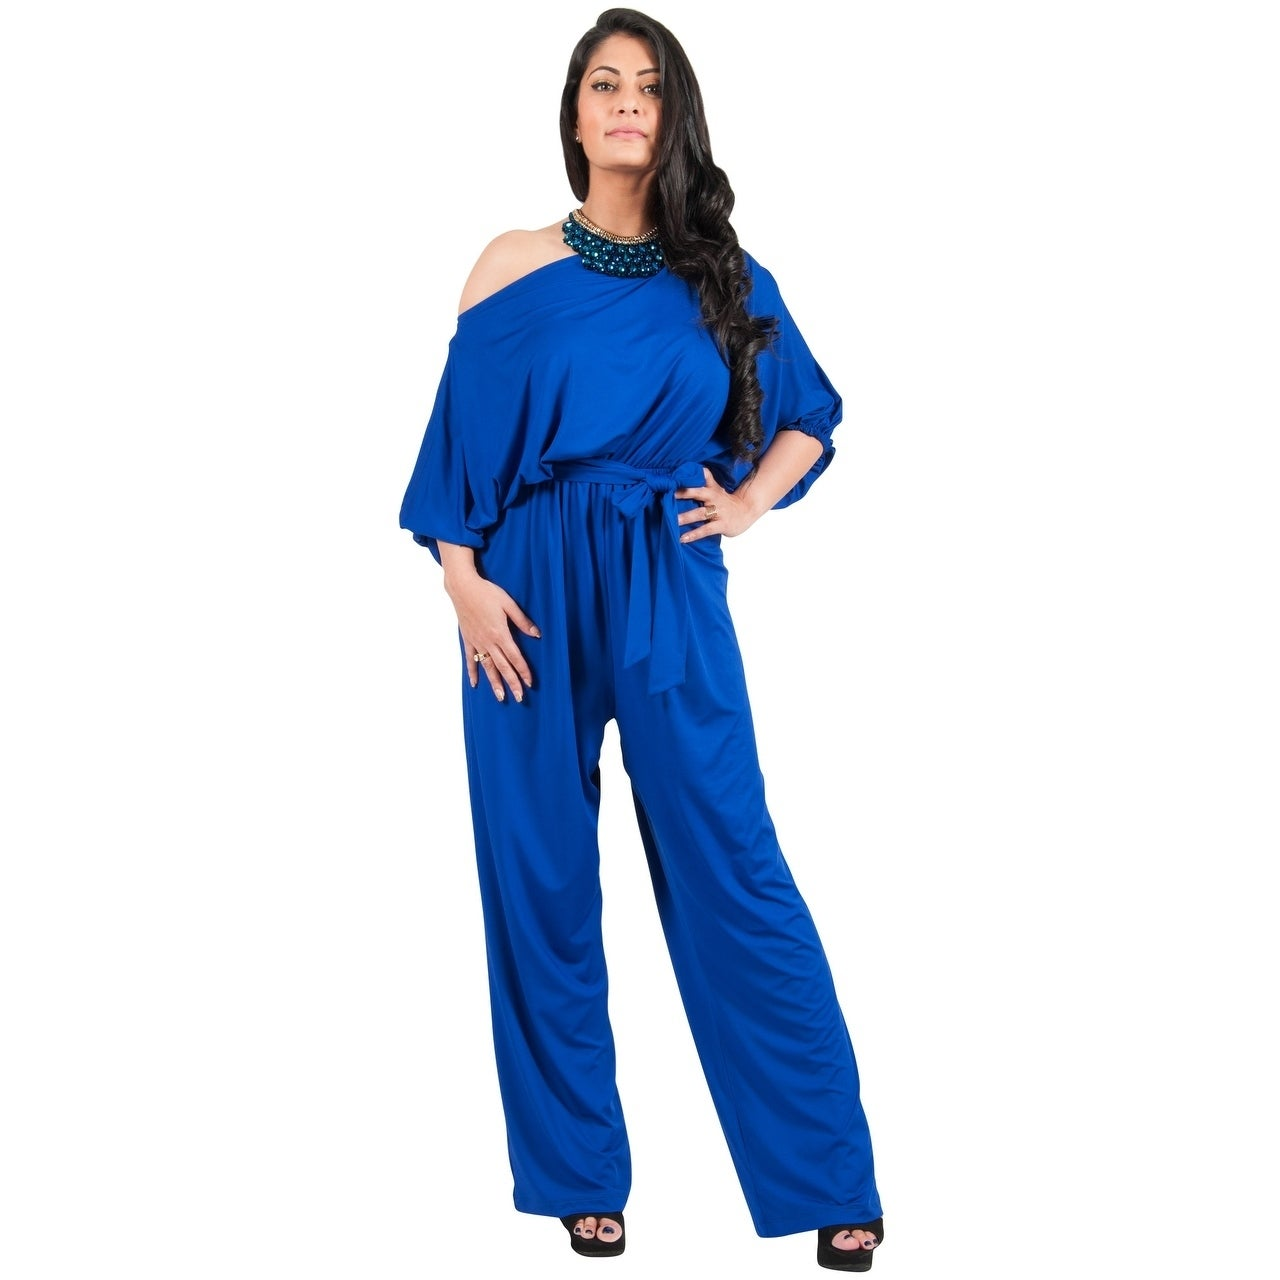 856955bcea2 Shop Adelyn   Vivian Women s Spandex Blend Plus Size One Shoulder Jumpsuit  Romper - Free Shipping Today - Overstock - 14086294